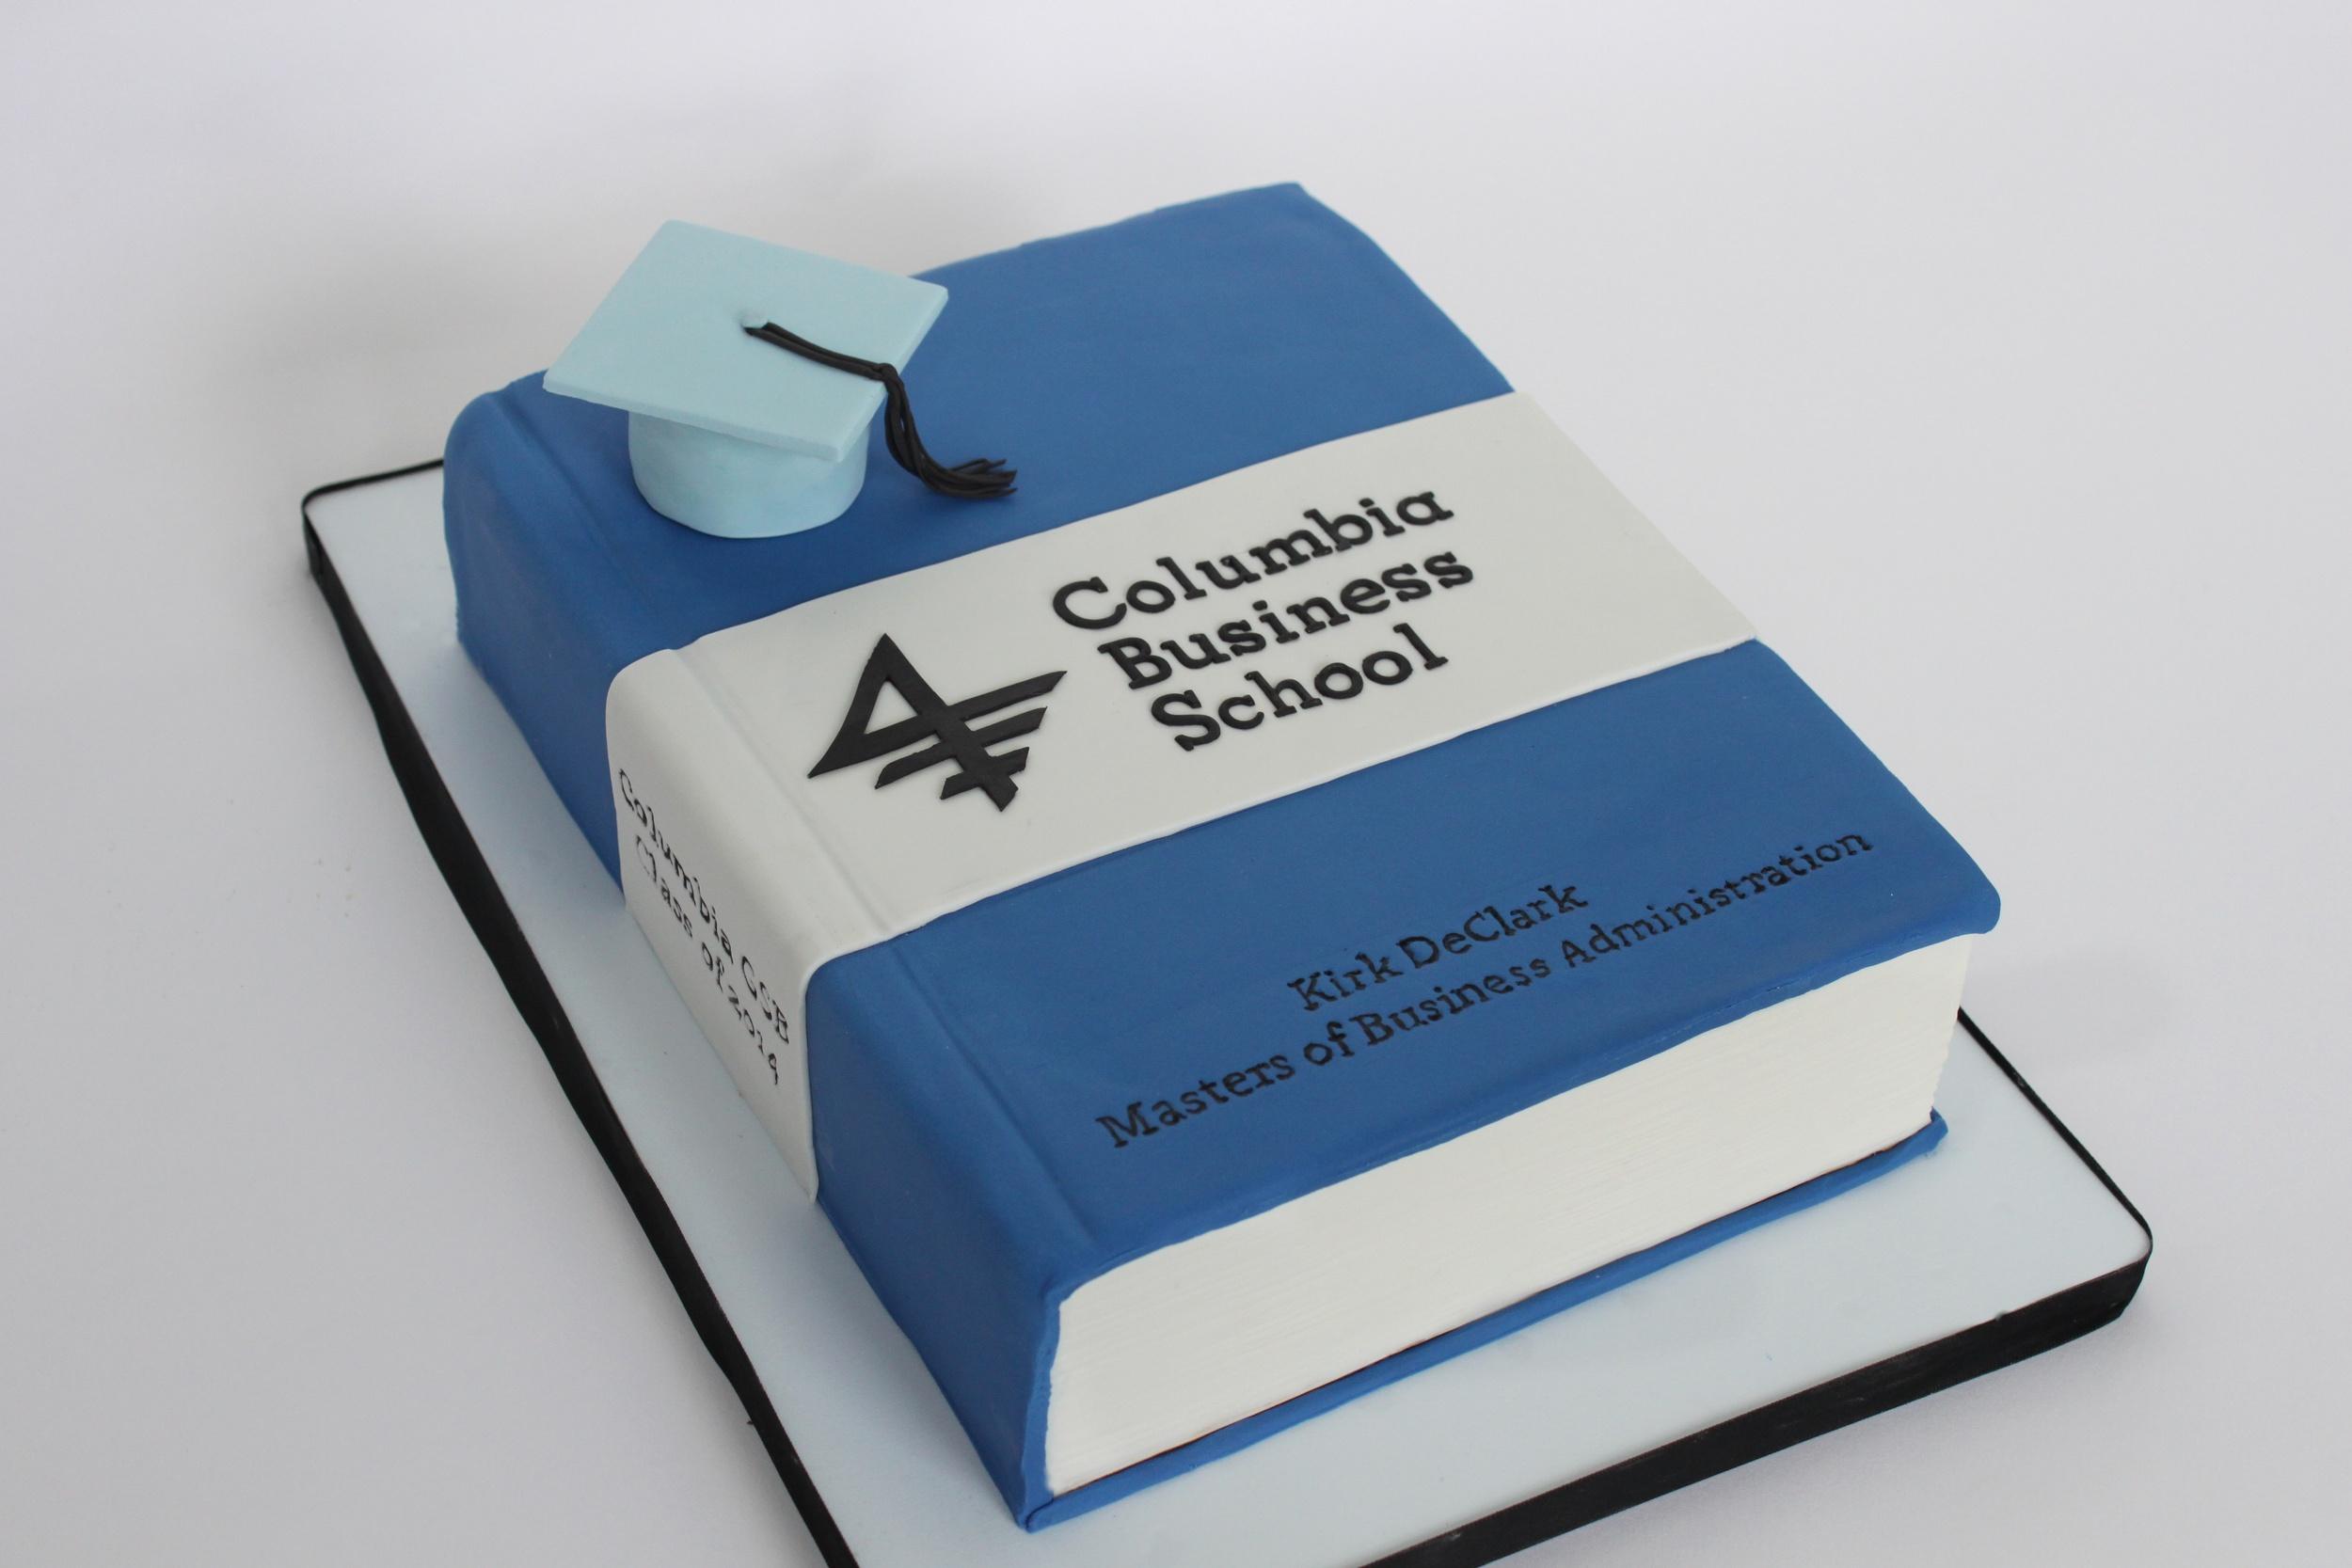 Columbia MBA book 9241.jpg